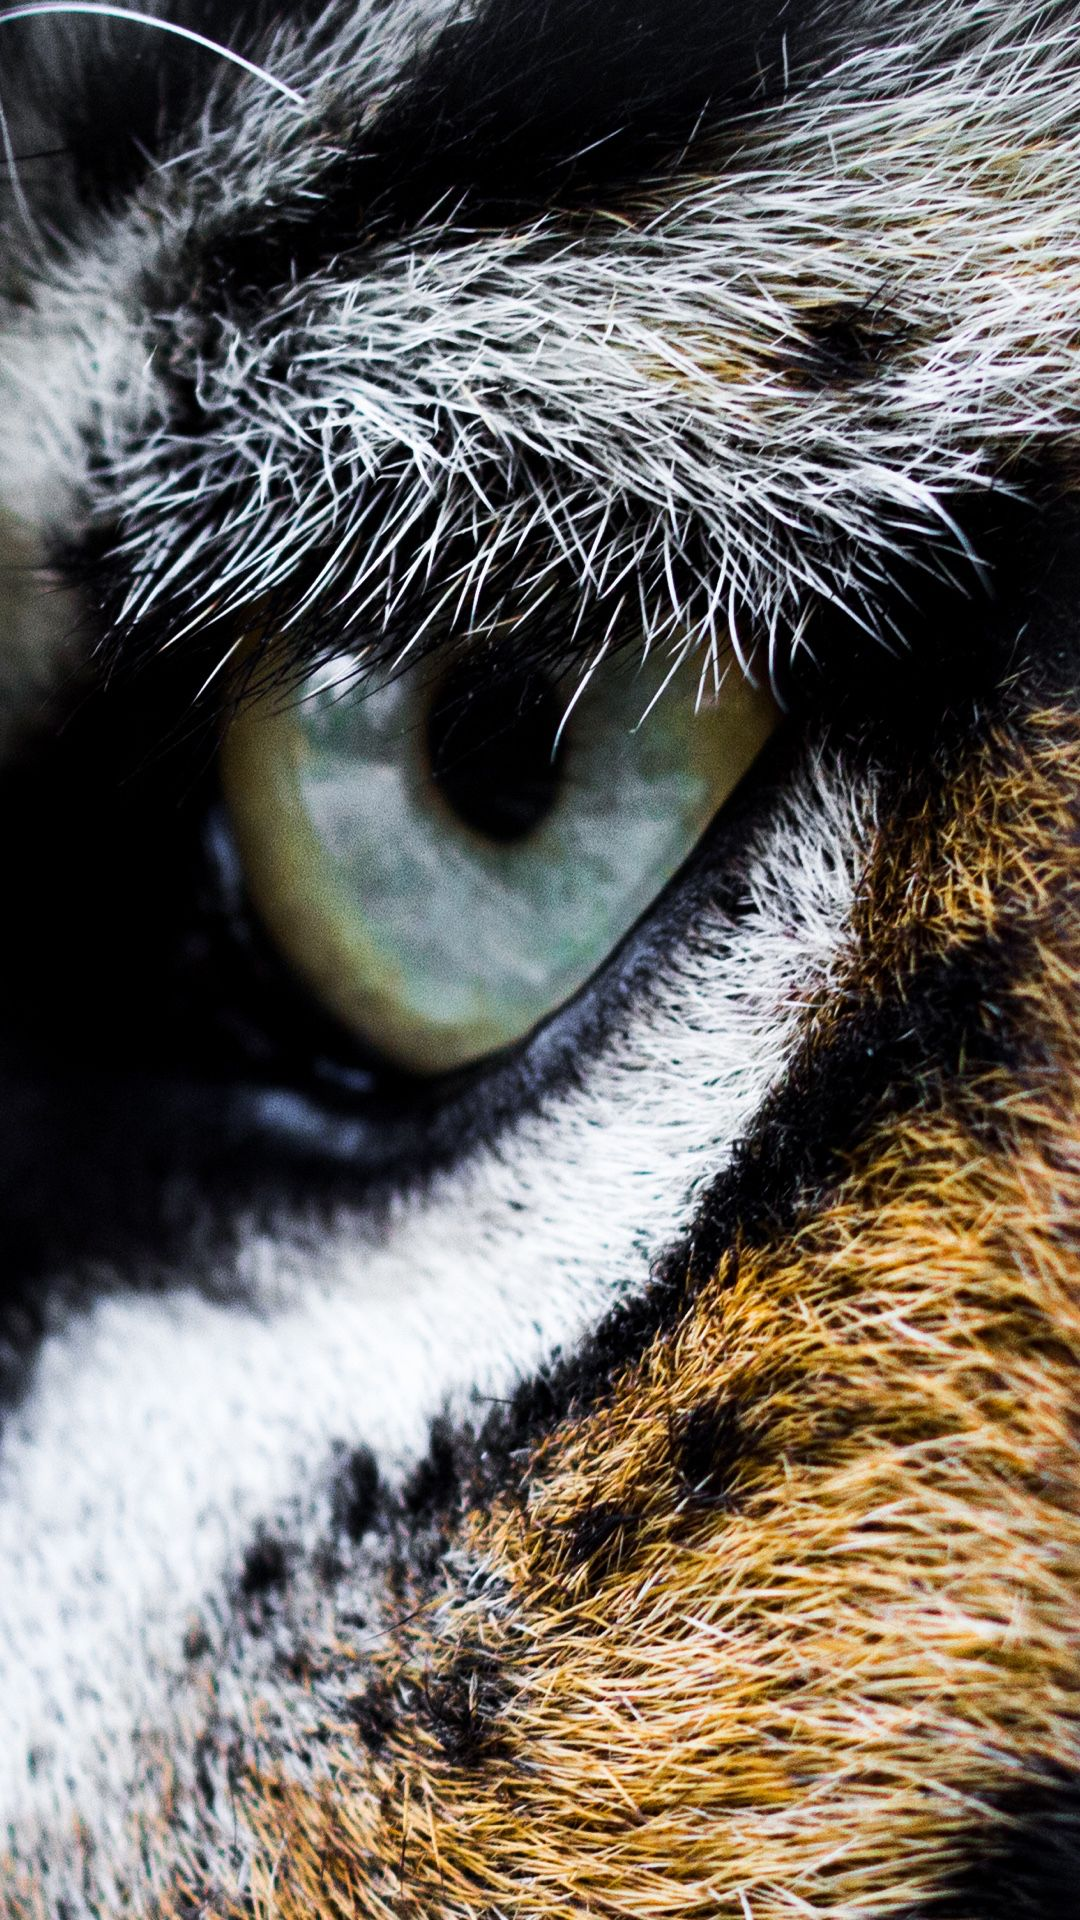 Hd Images Of Tiger Eyes   PeepsBurgh 1080x1920